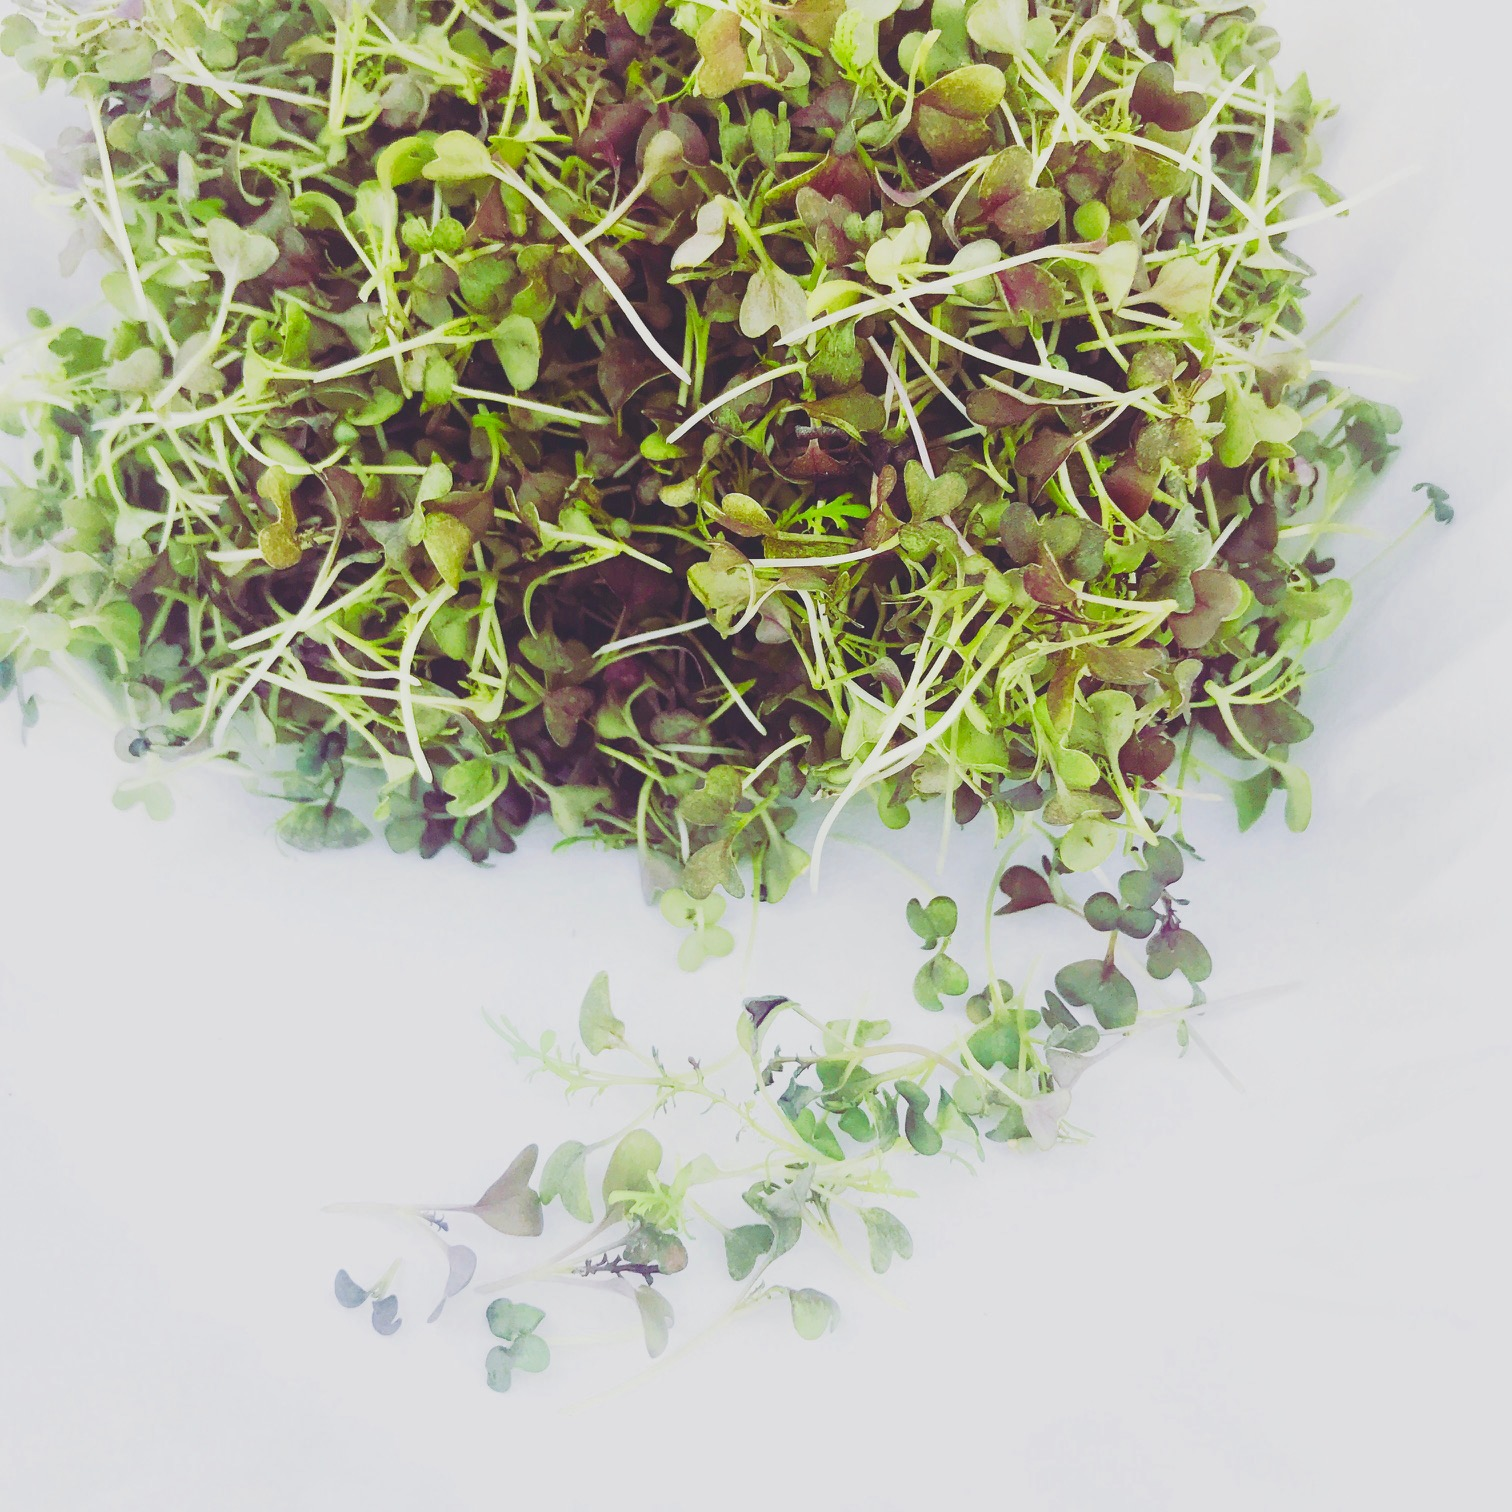 Flavor 2-8 Bloom Microgreens_pic8.jpg